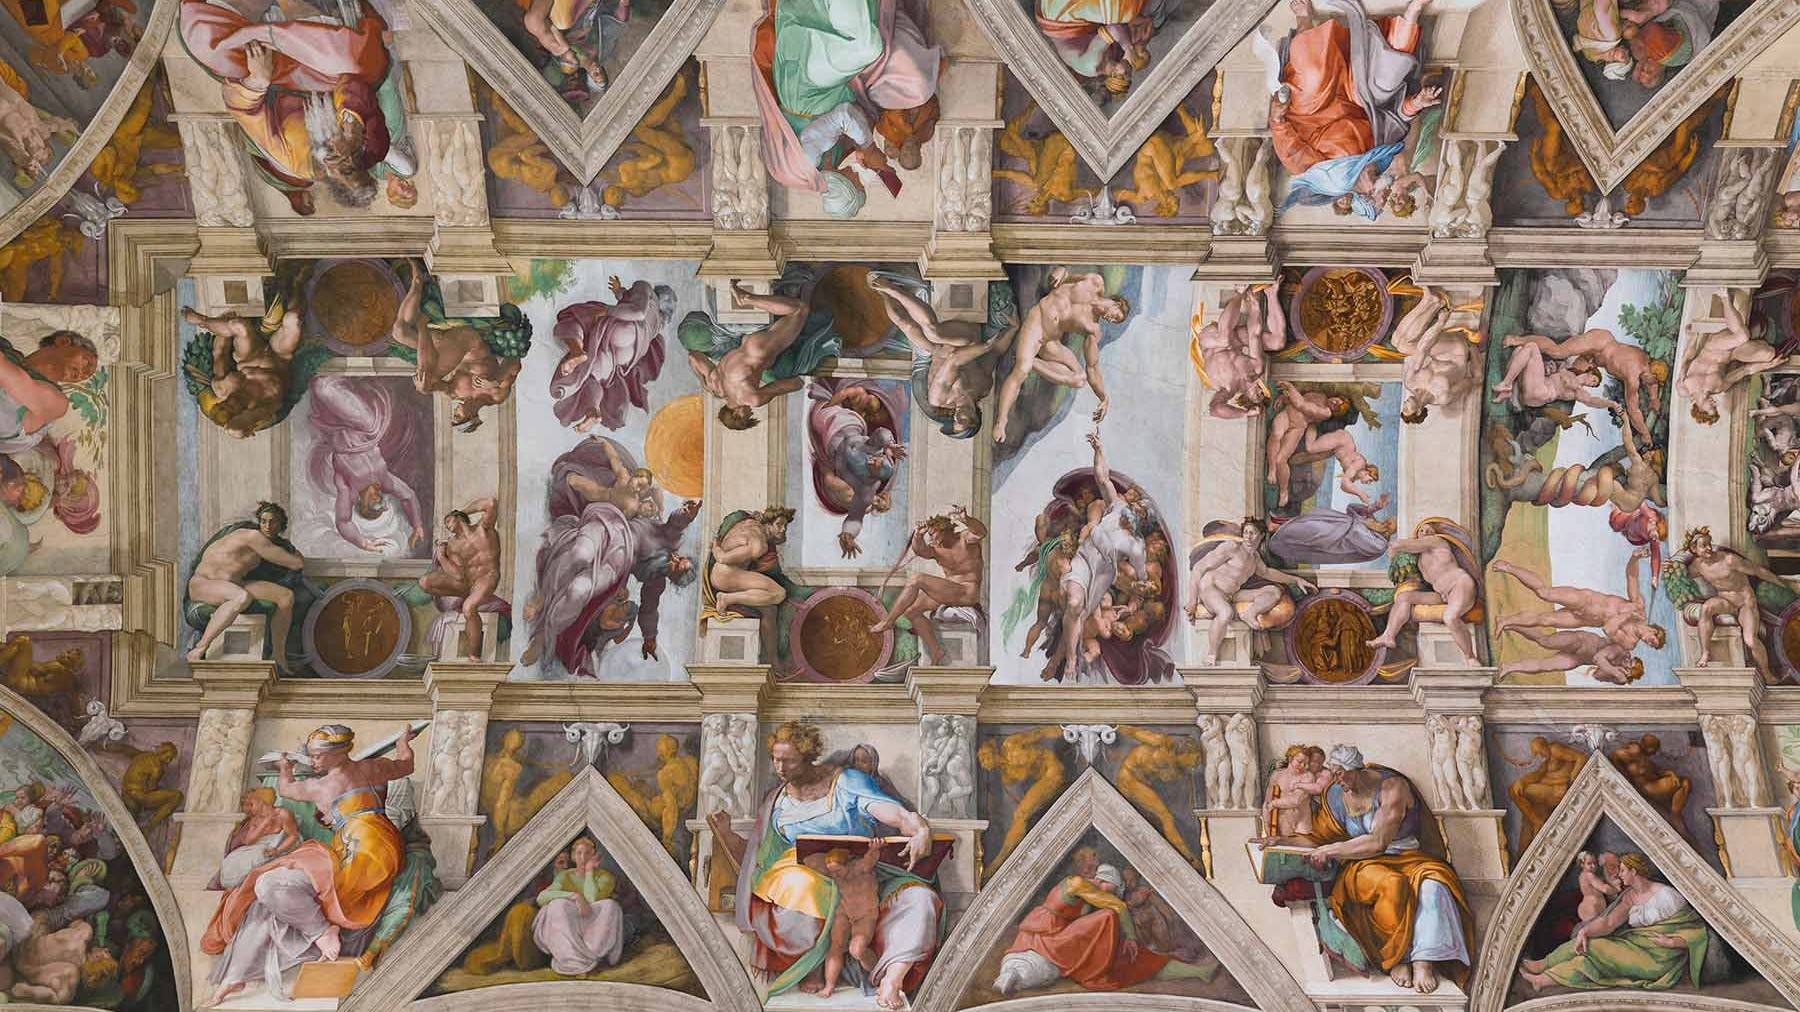 The Sistine Chapel Got an LED Upgrade